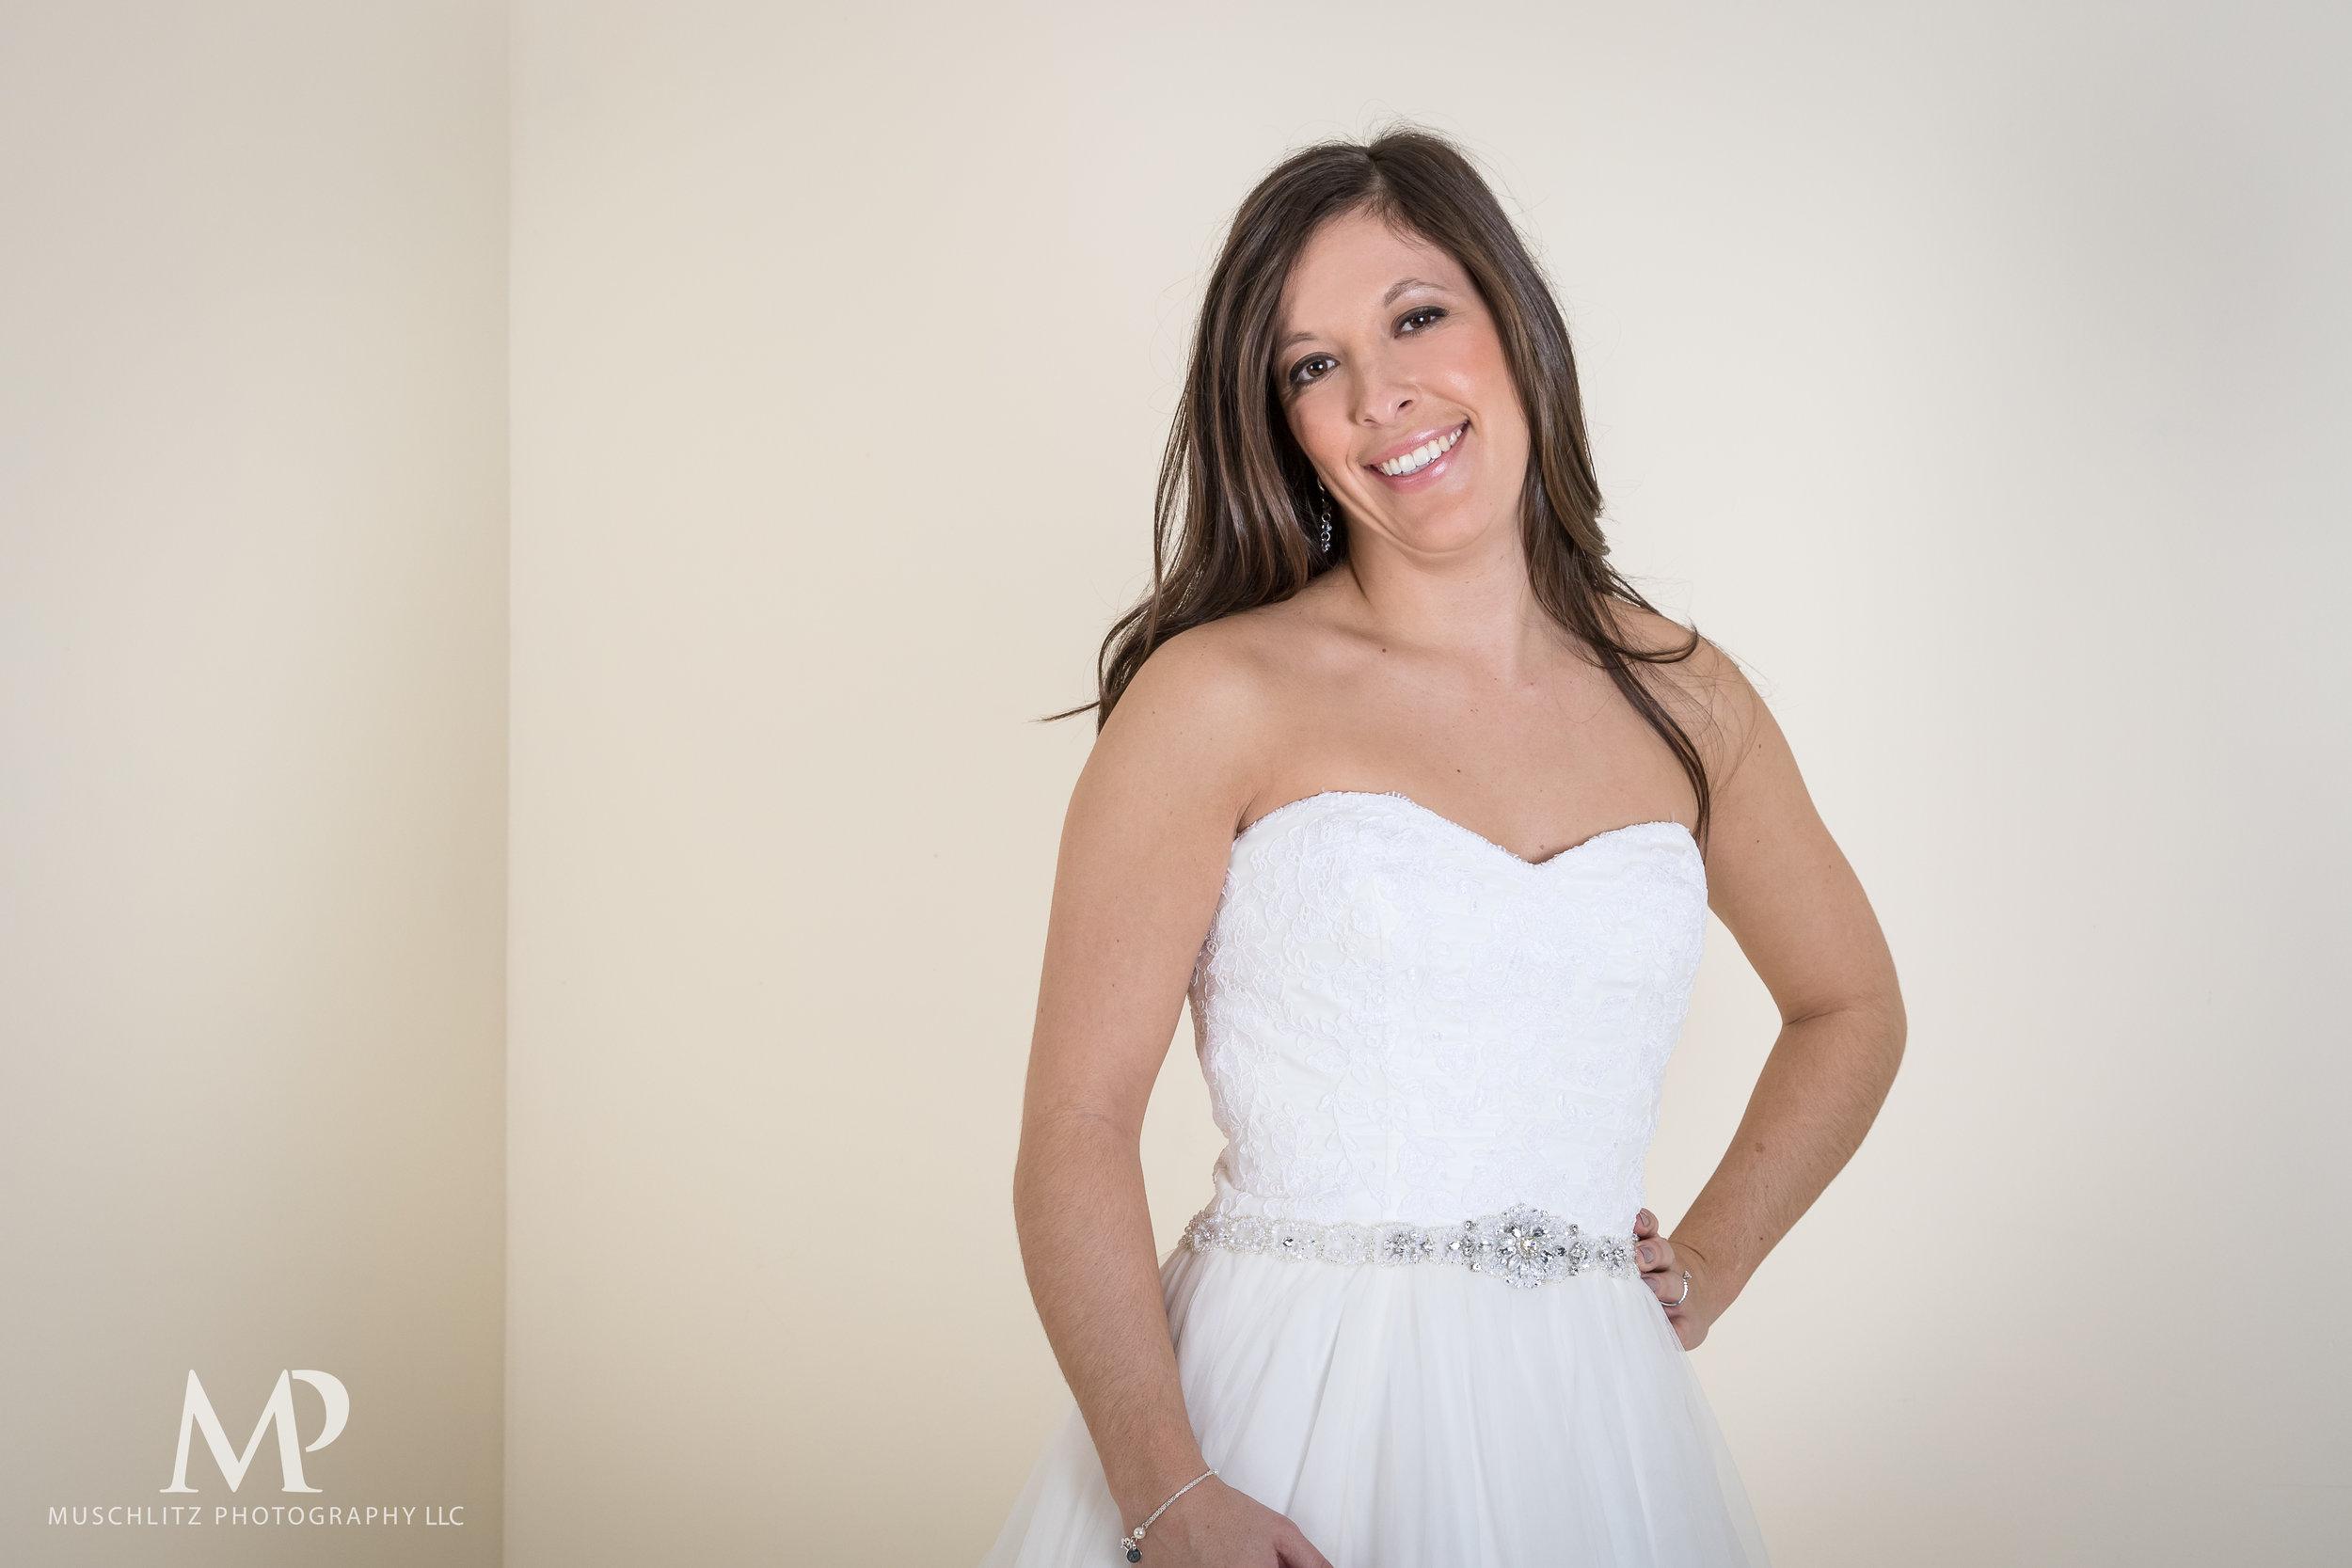 beauty-bridal-glam-the-dress-portraits-photographer-studio-columbus-ohio-gahanna-muschlitz-photography-017.JPG